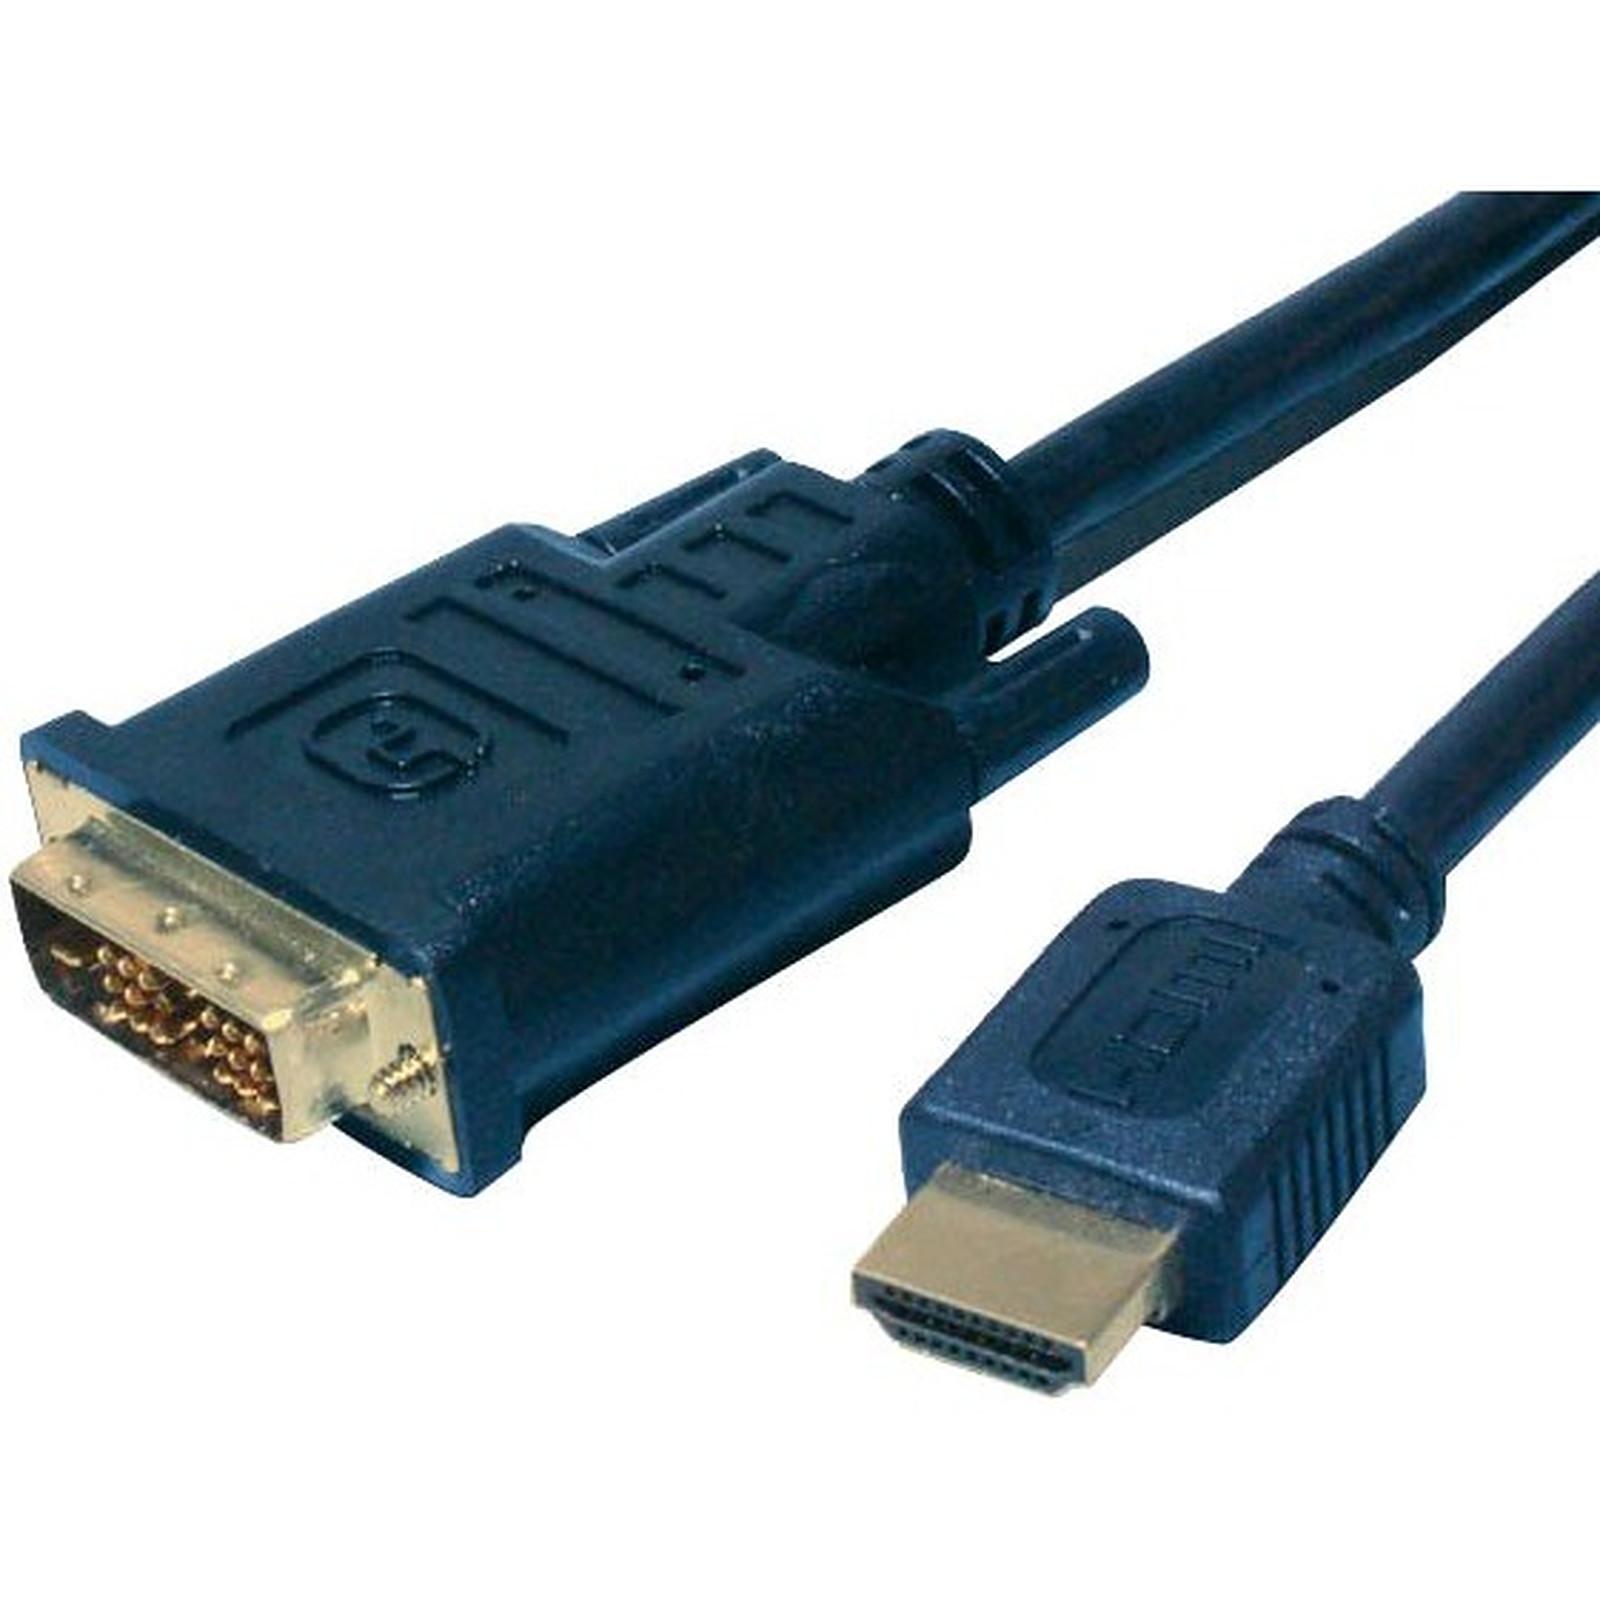 Cable DVI-D Single Link macho / HDMI macho (5 metros)